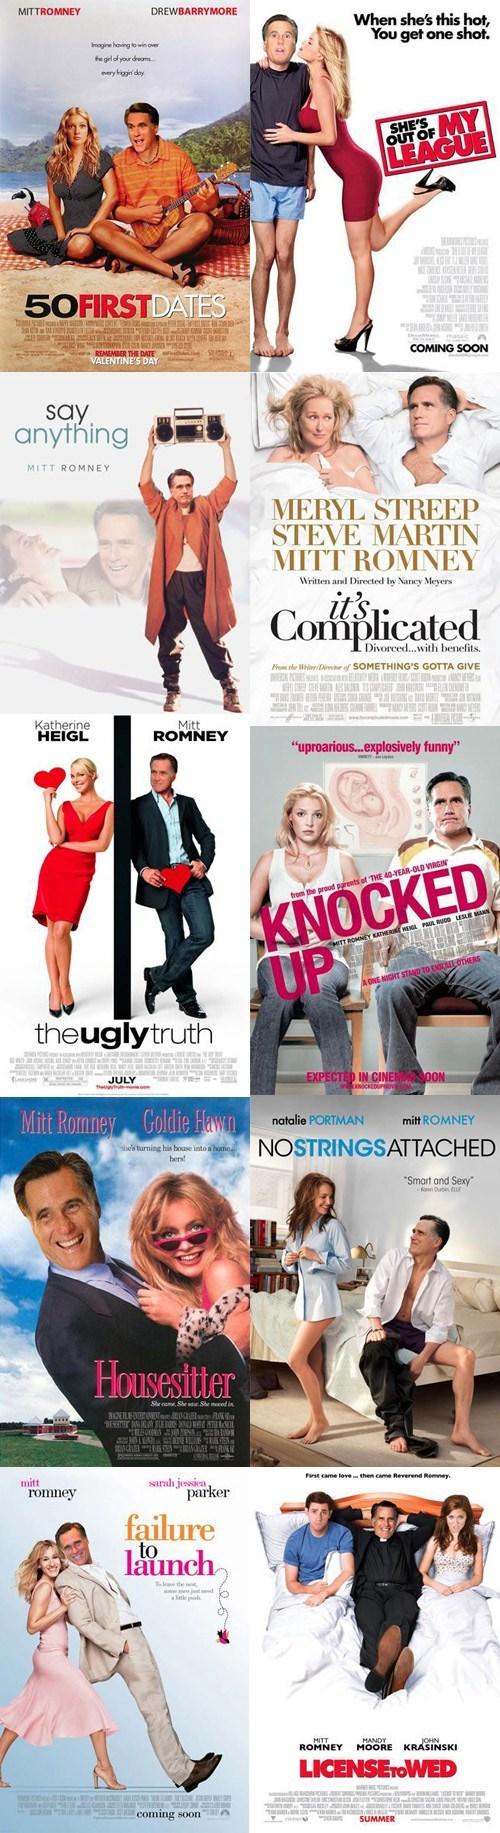 Mitt Romney,movies,posters,romantic comedies